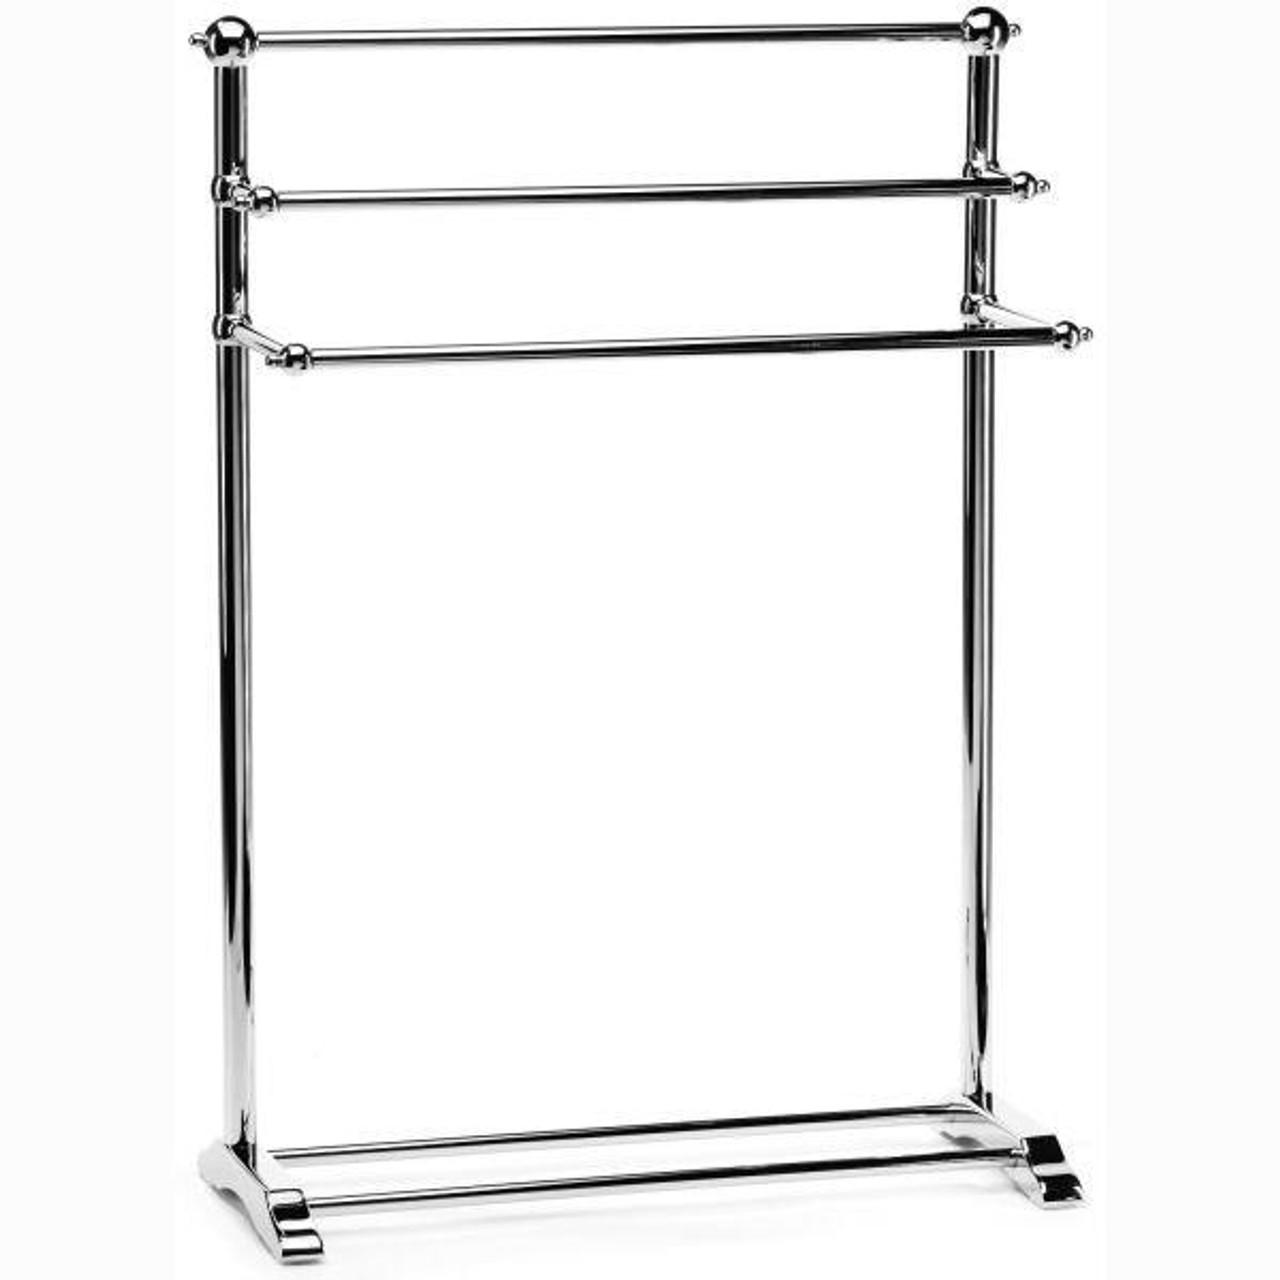 Chrome Plated Samuel Heath Freestanding Towel Stand L908